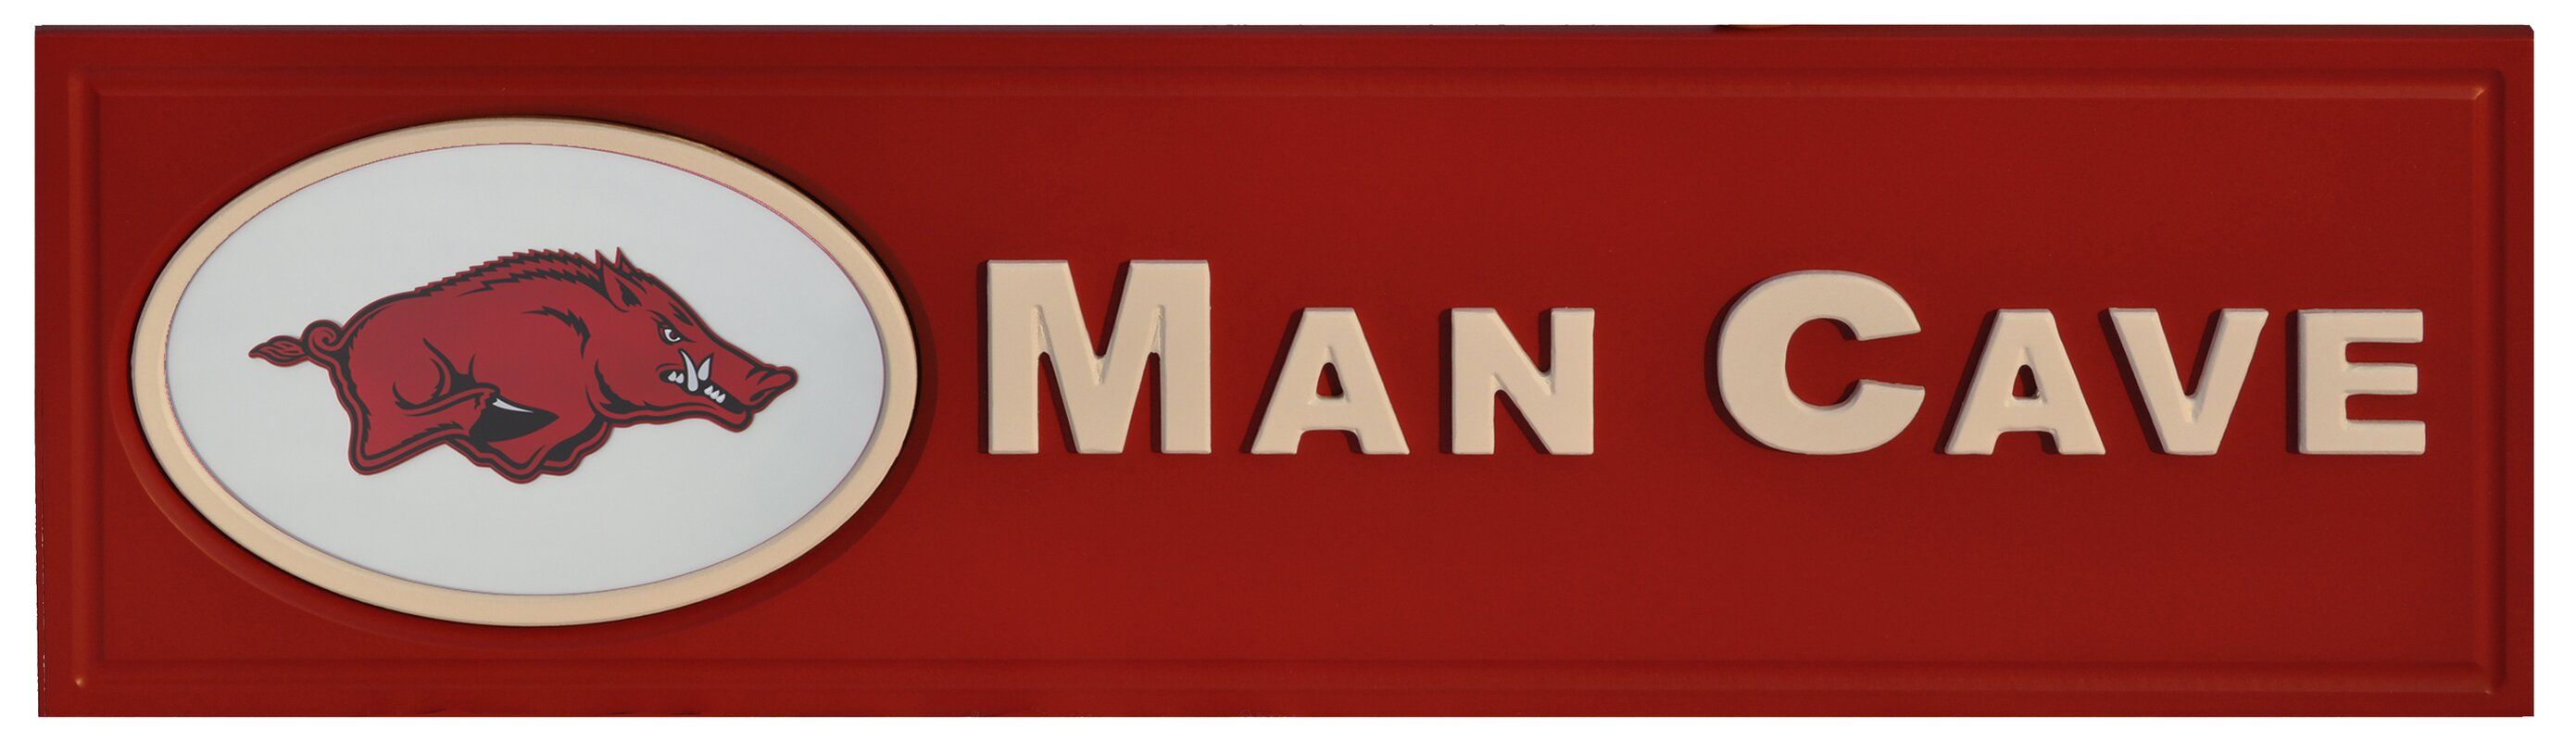 NCAA Man Cave Textual Art Plaque